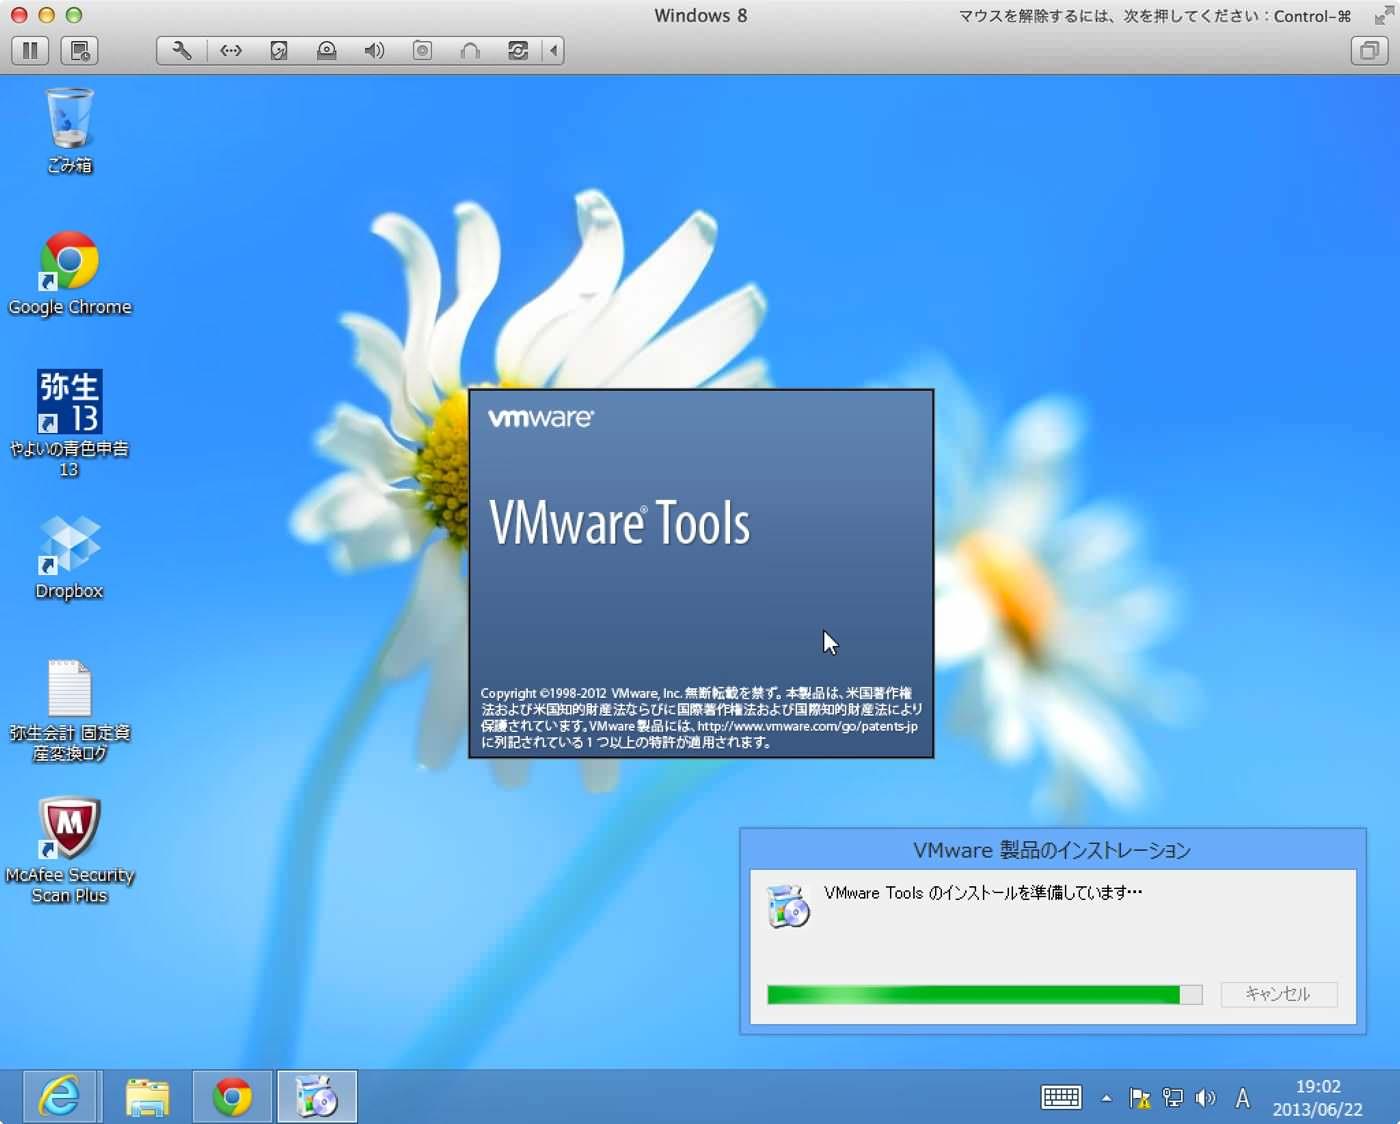 Vmware toolsのインストール準備中